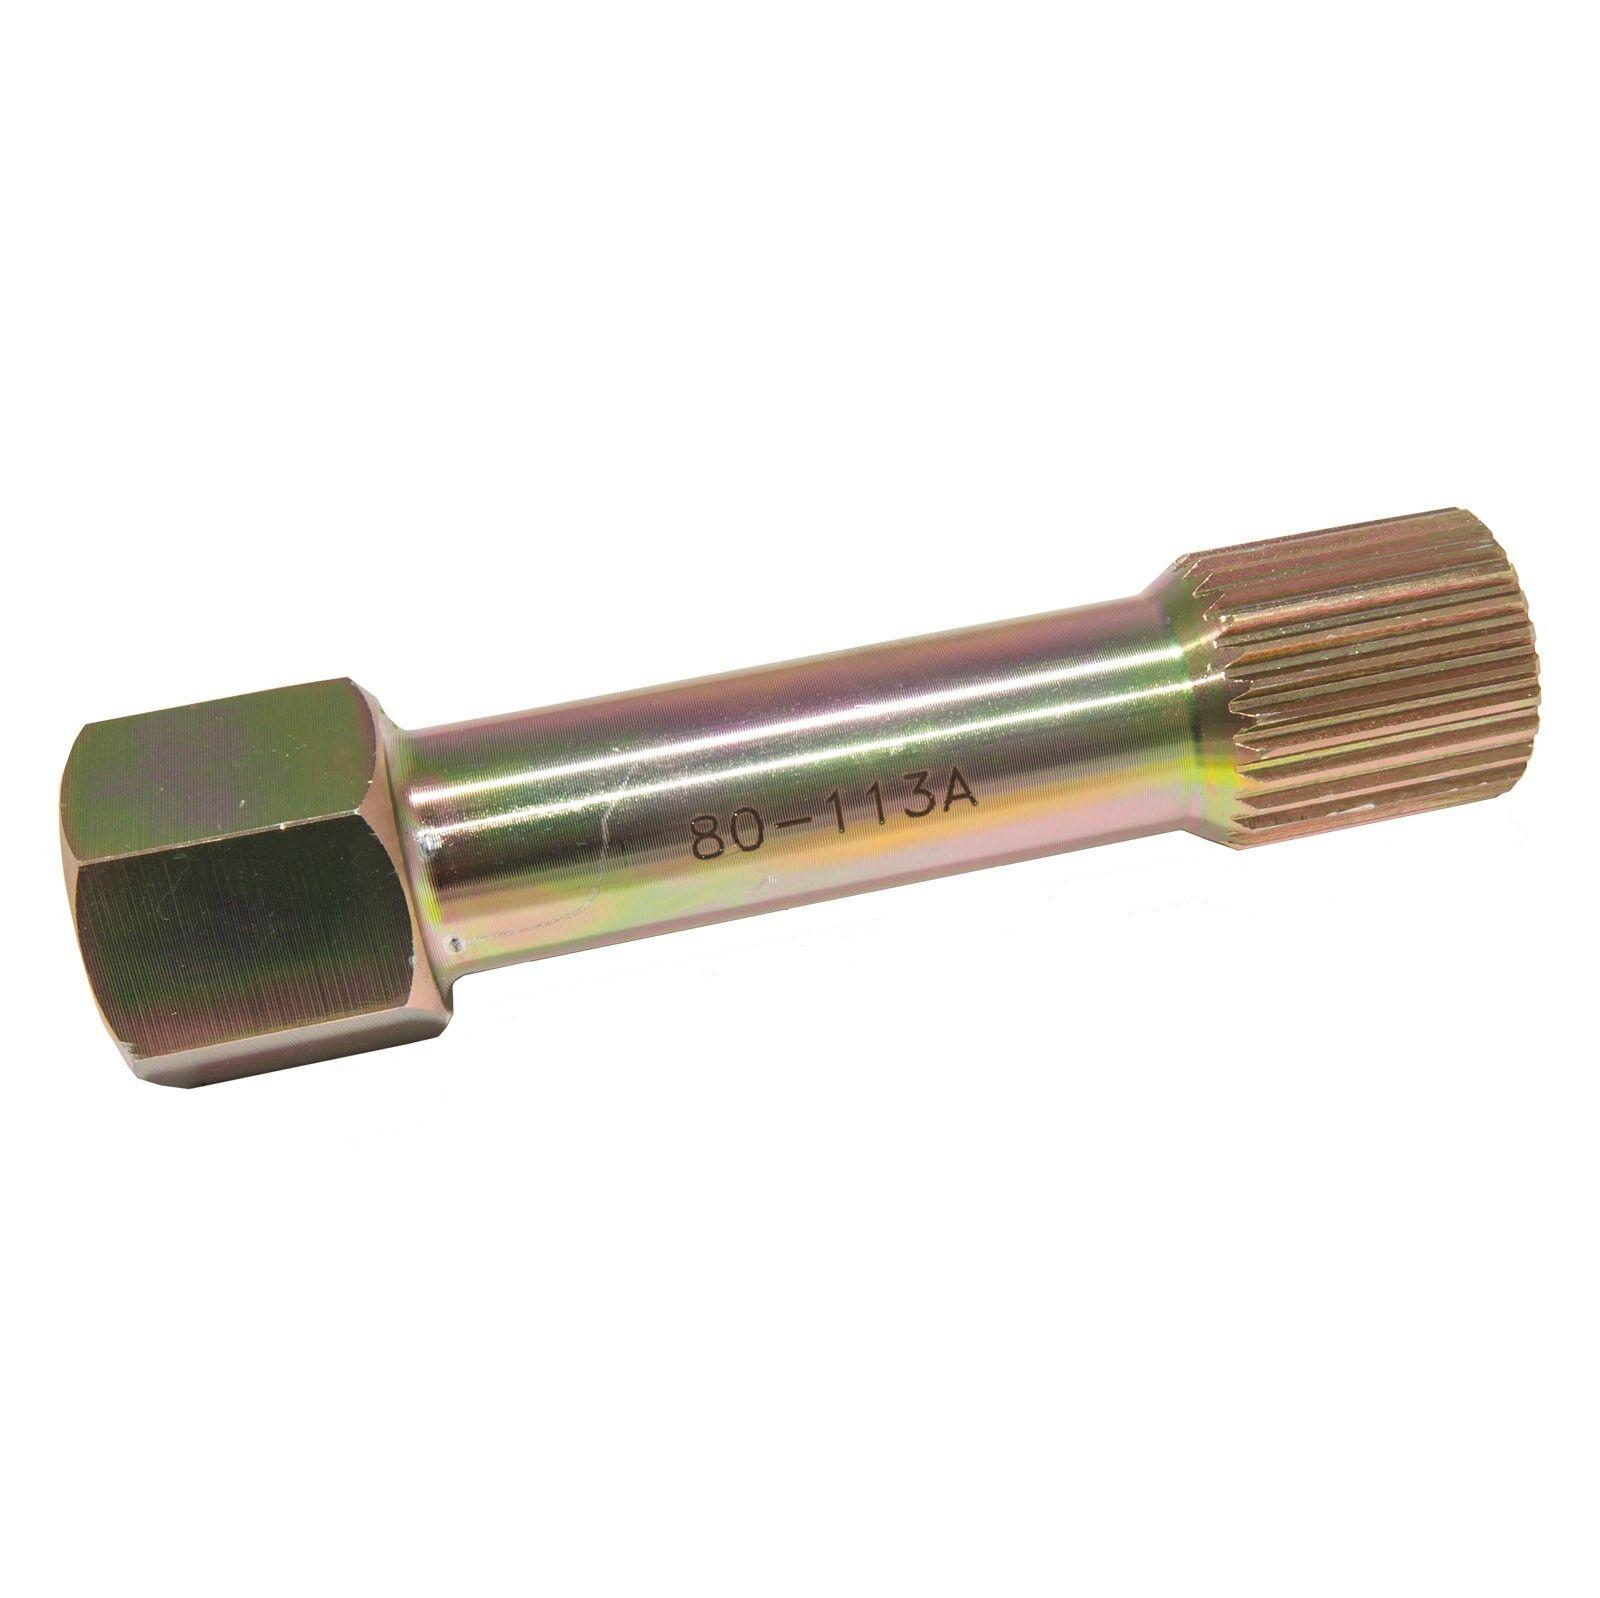 Propeller Puller Tool – Jerusalem House